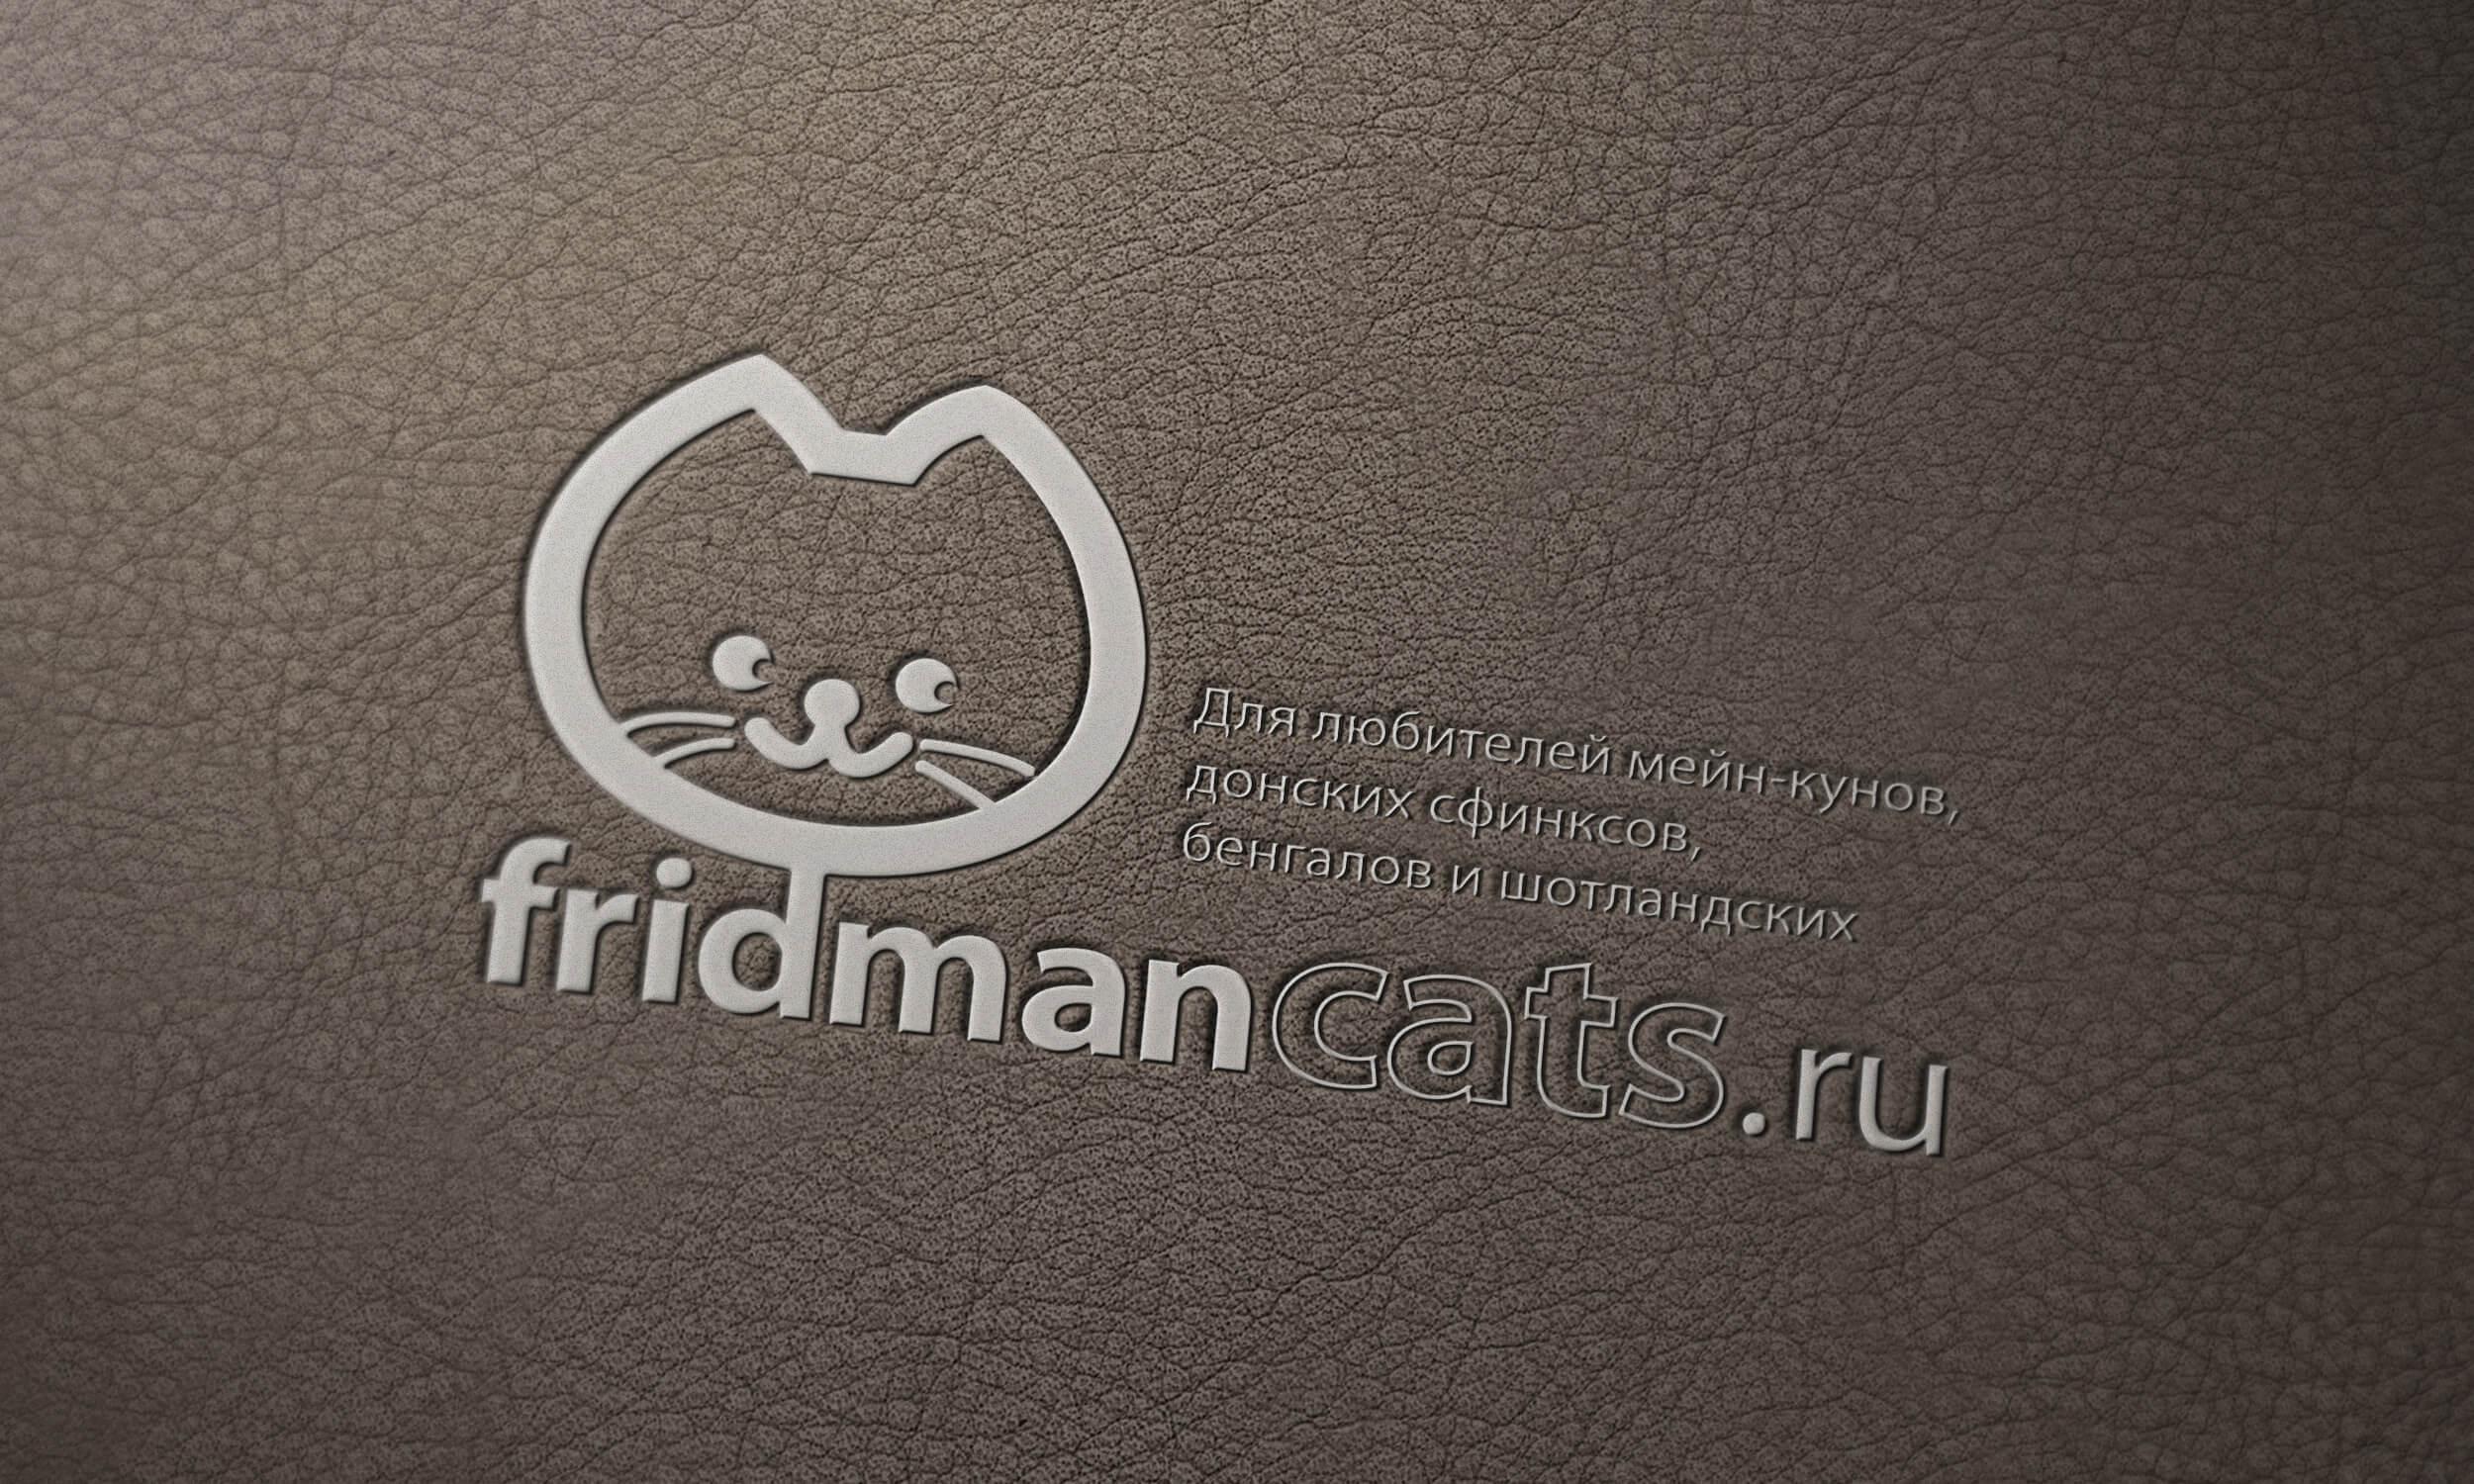 Логотип питомника Мейн кунов Фридманкатс